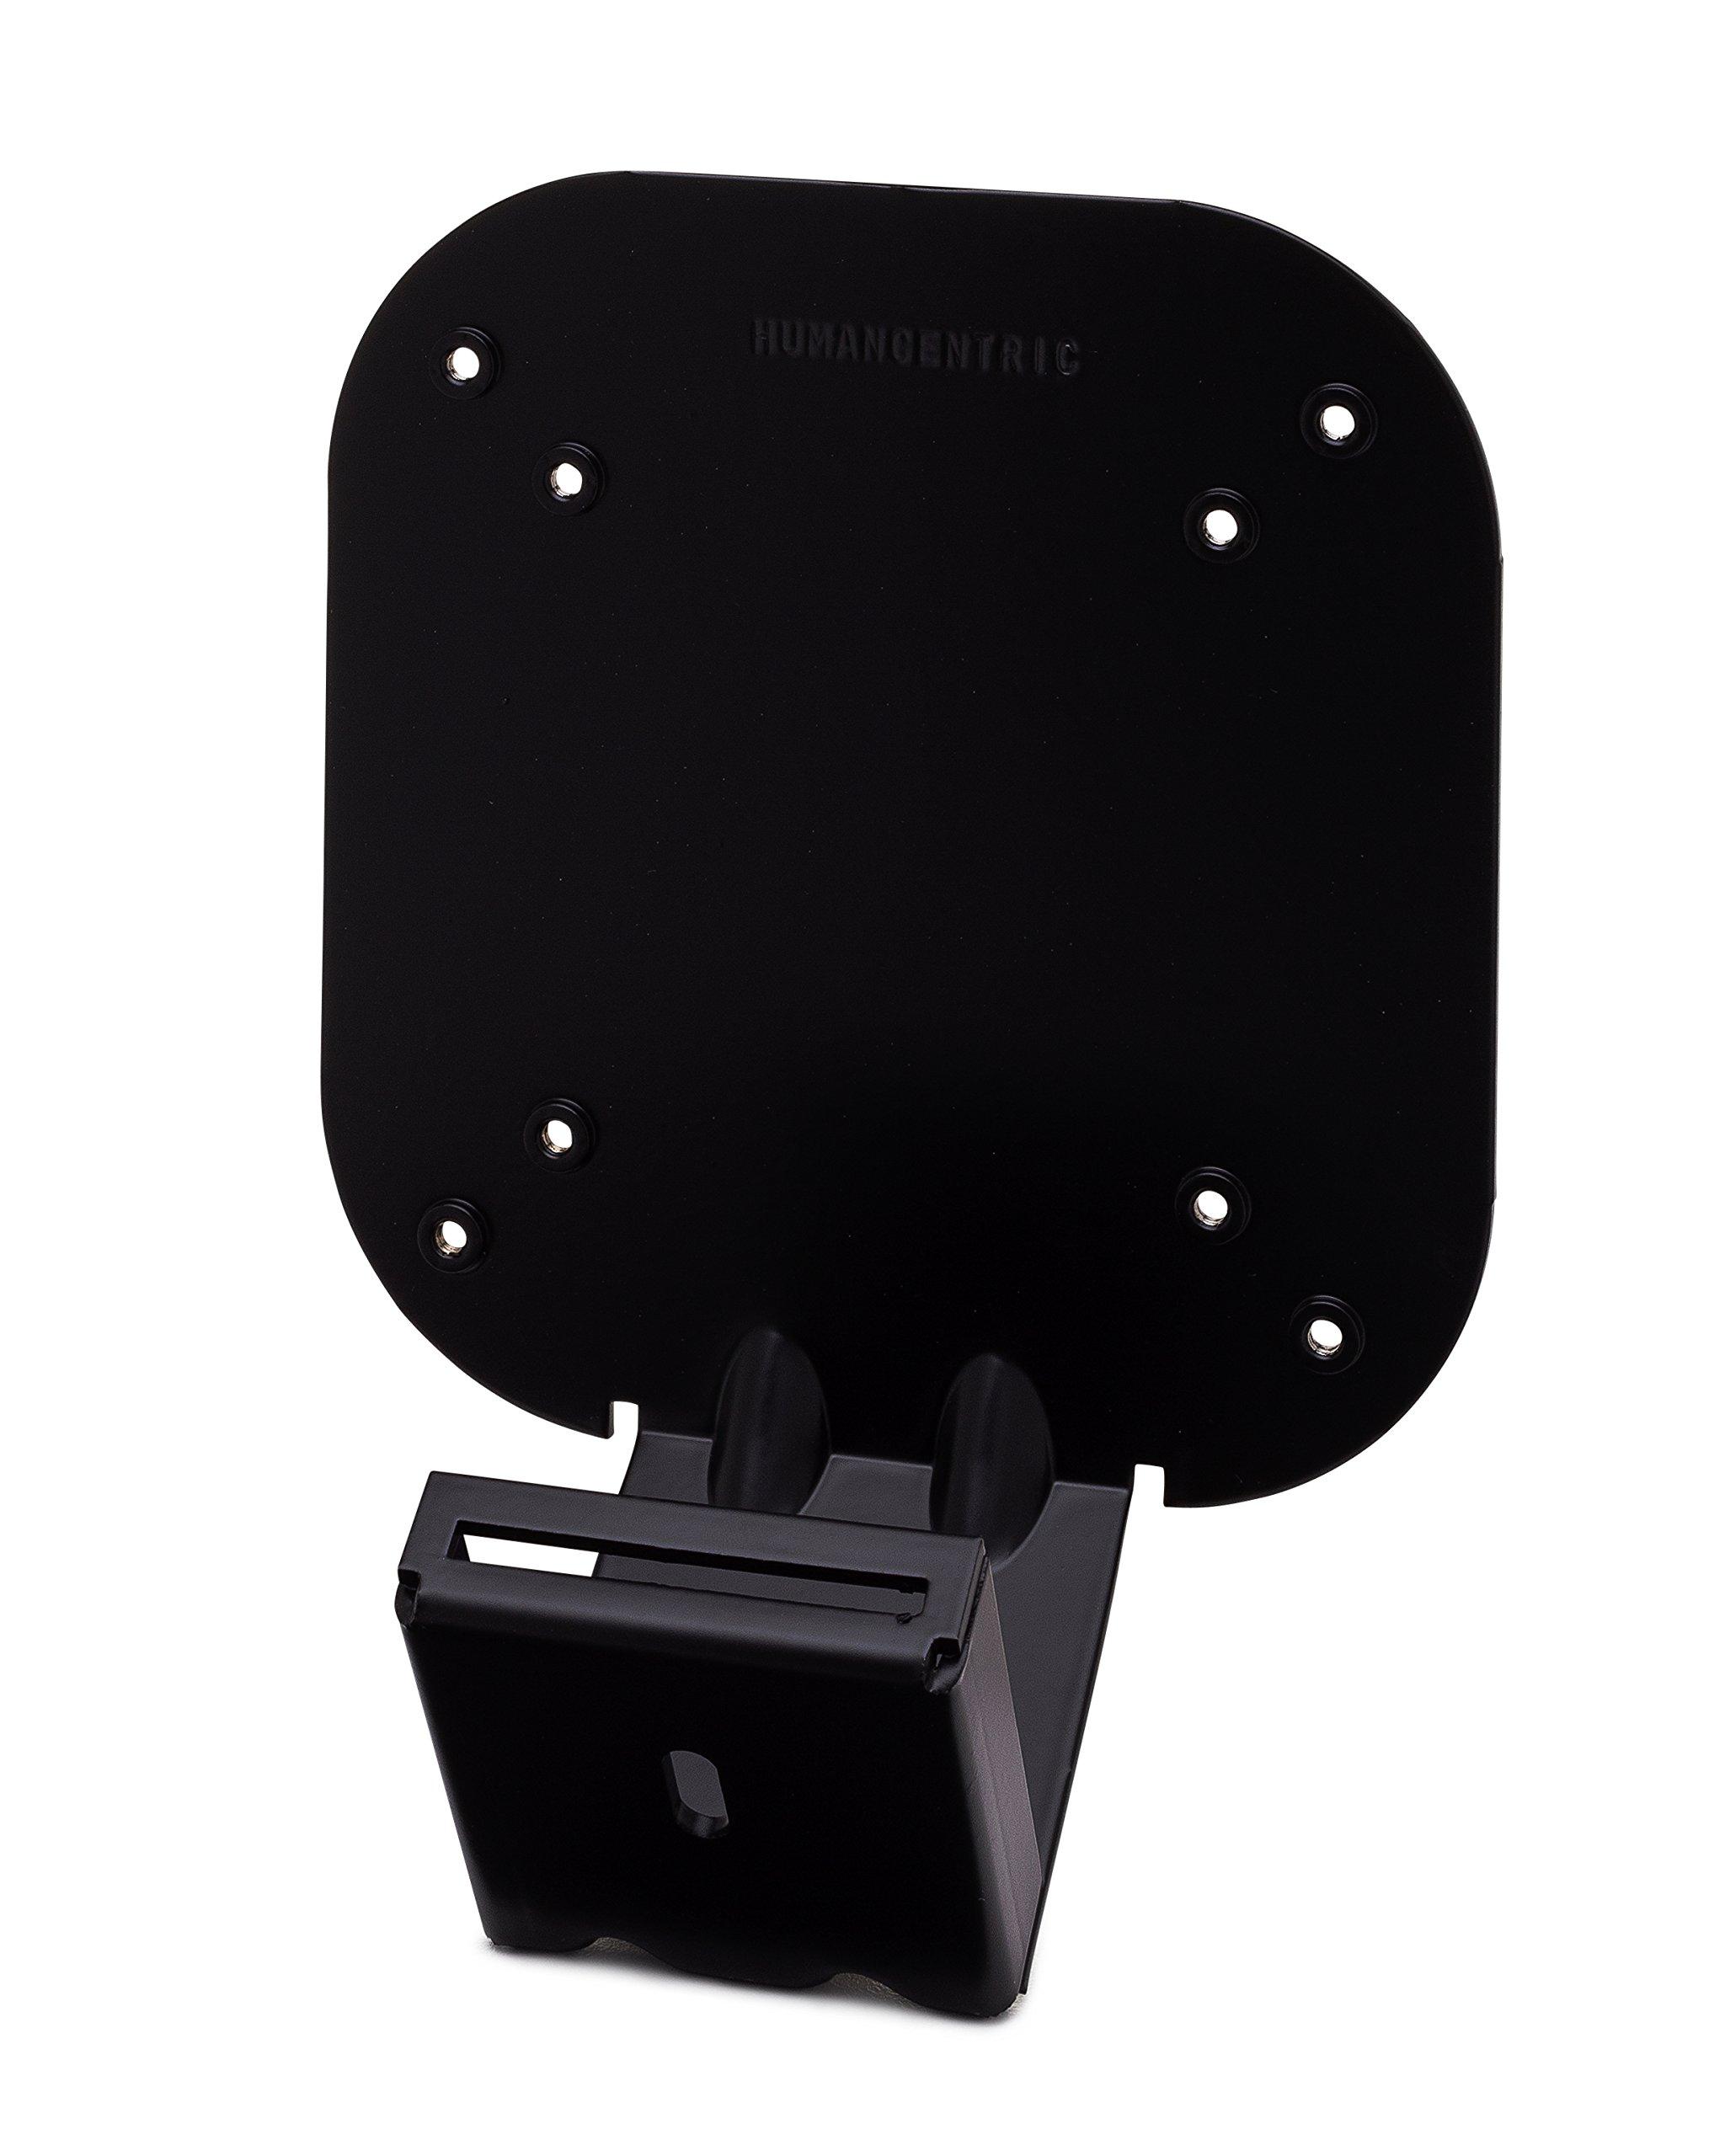 VESA Mount Adapter Bracket for Samsung Monitors U28D590D and S24D590PL - by HumanCentric